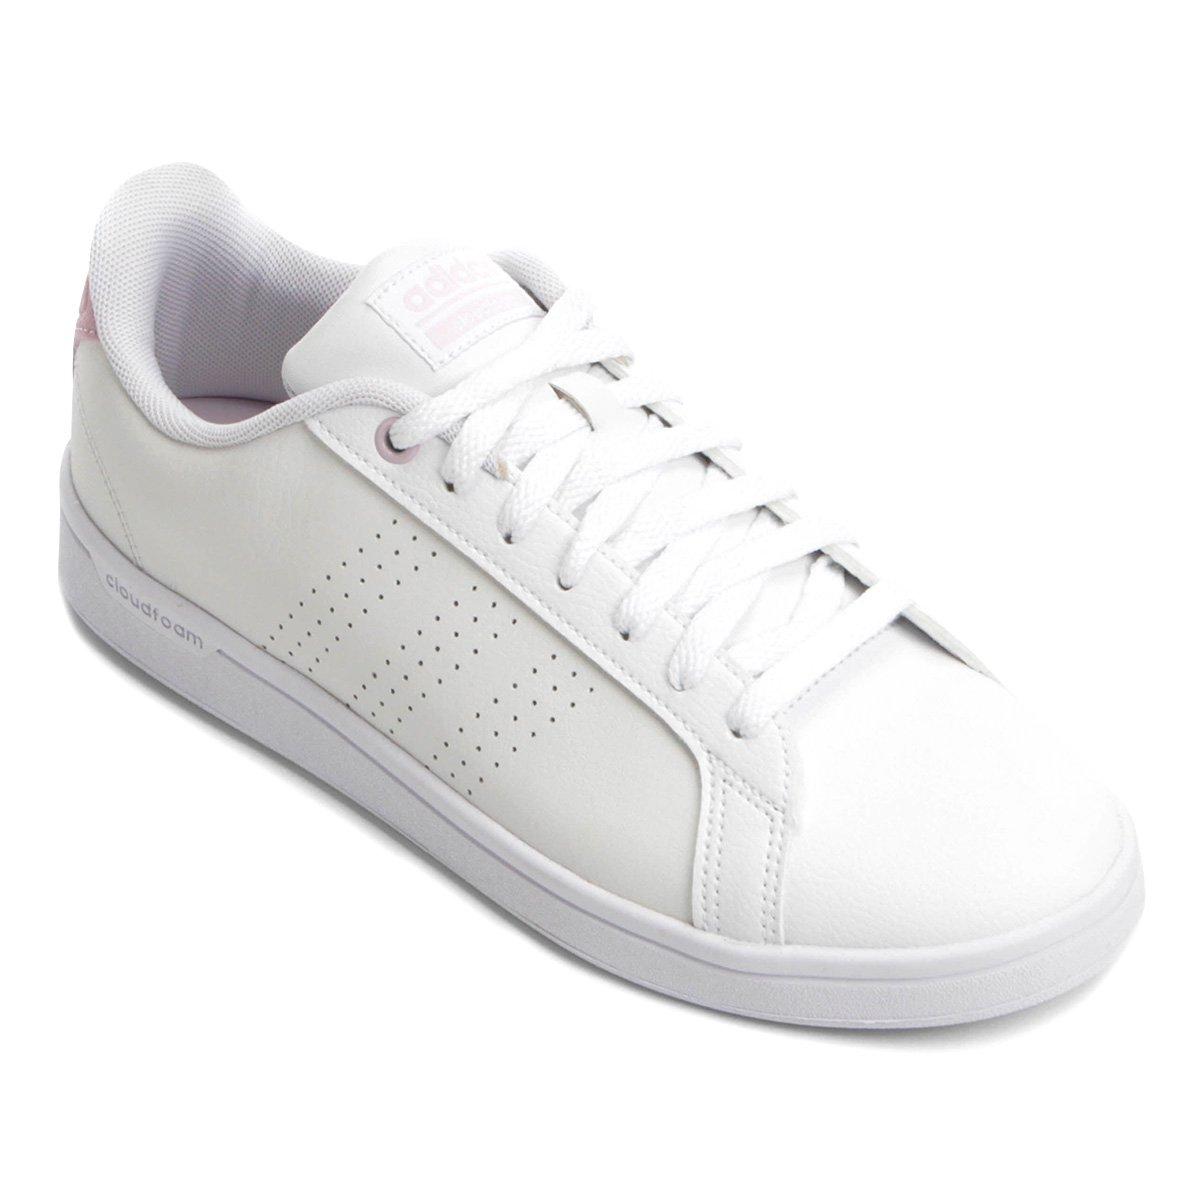 62394823a Tênis Adidas Cf Advantage Clean Feminino - Branco e Rosa - Compre Agora